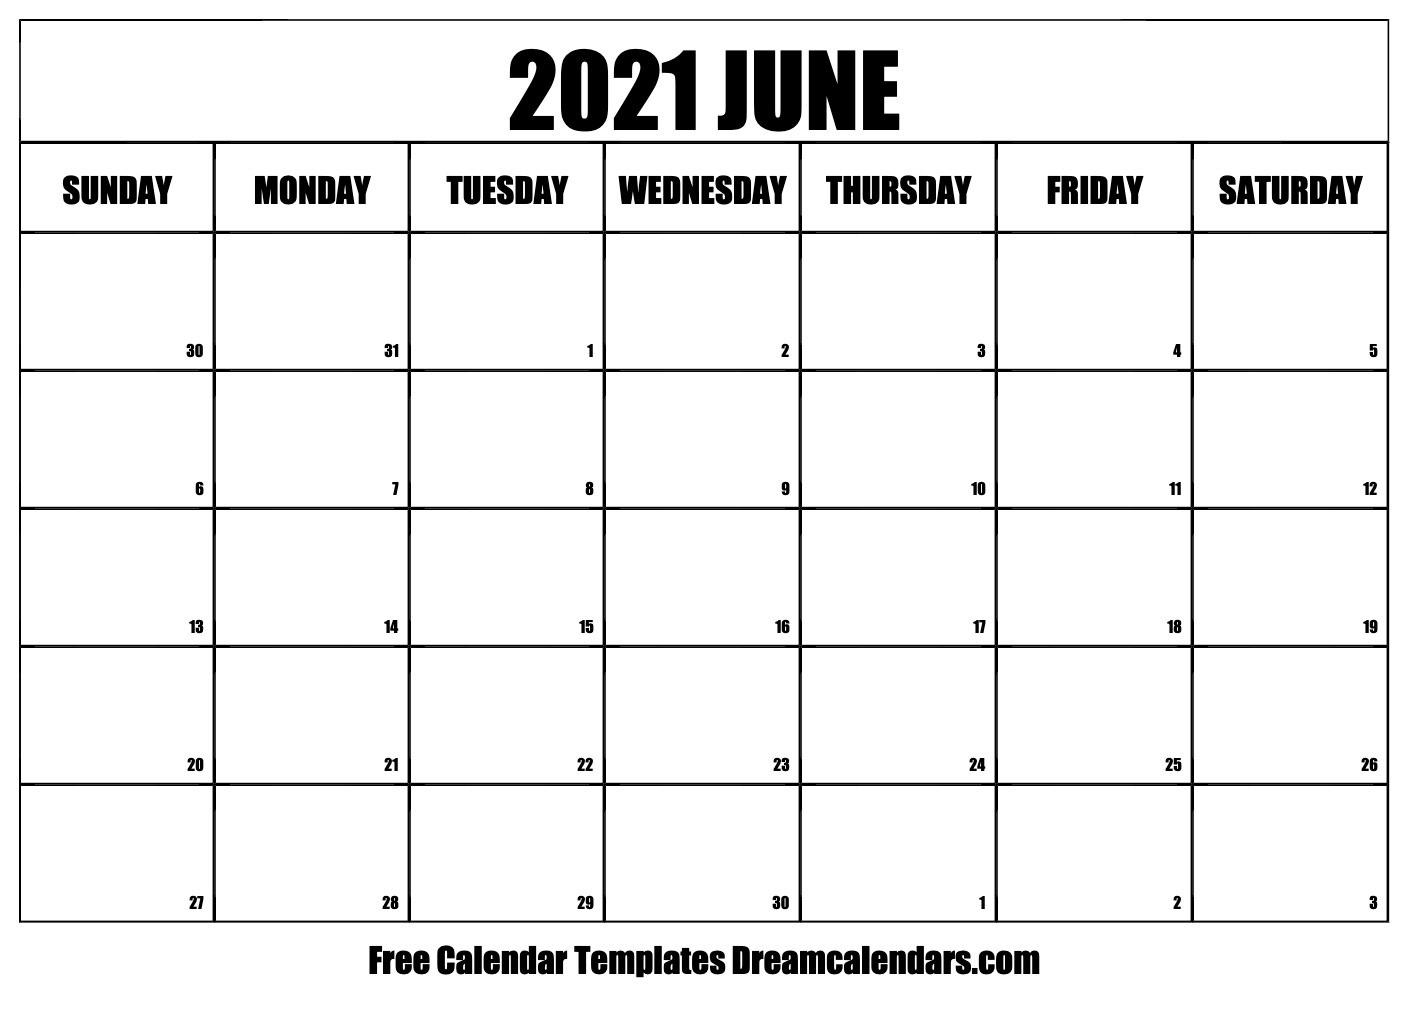 June 2021 Calendar | Free Blank Printable Templates  Monthly Payment Sheet June, 2021